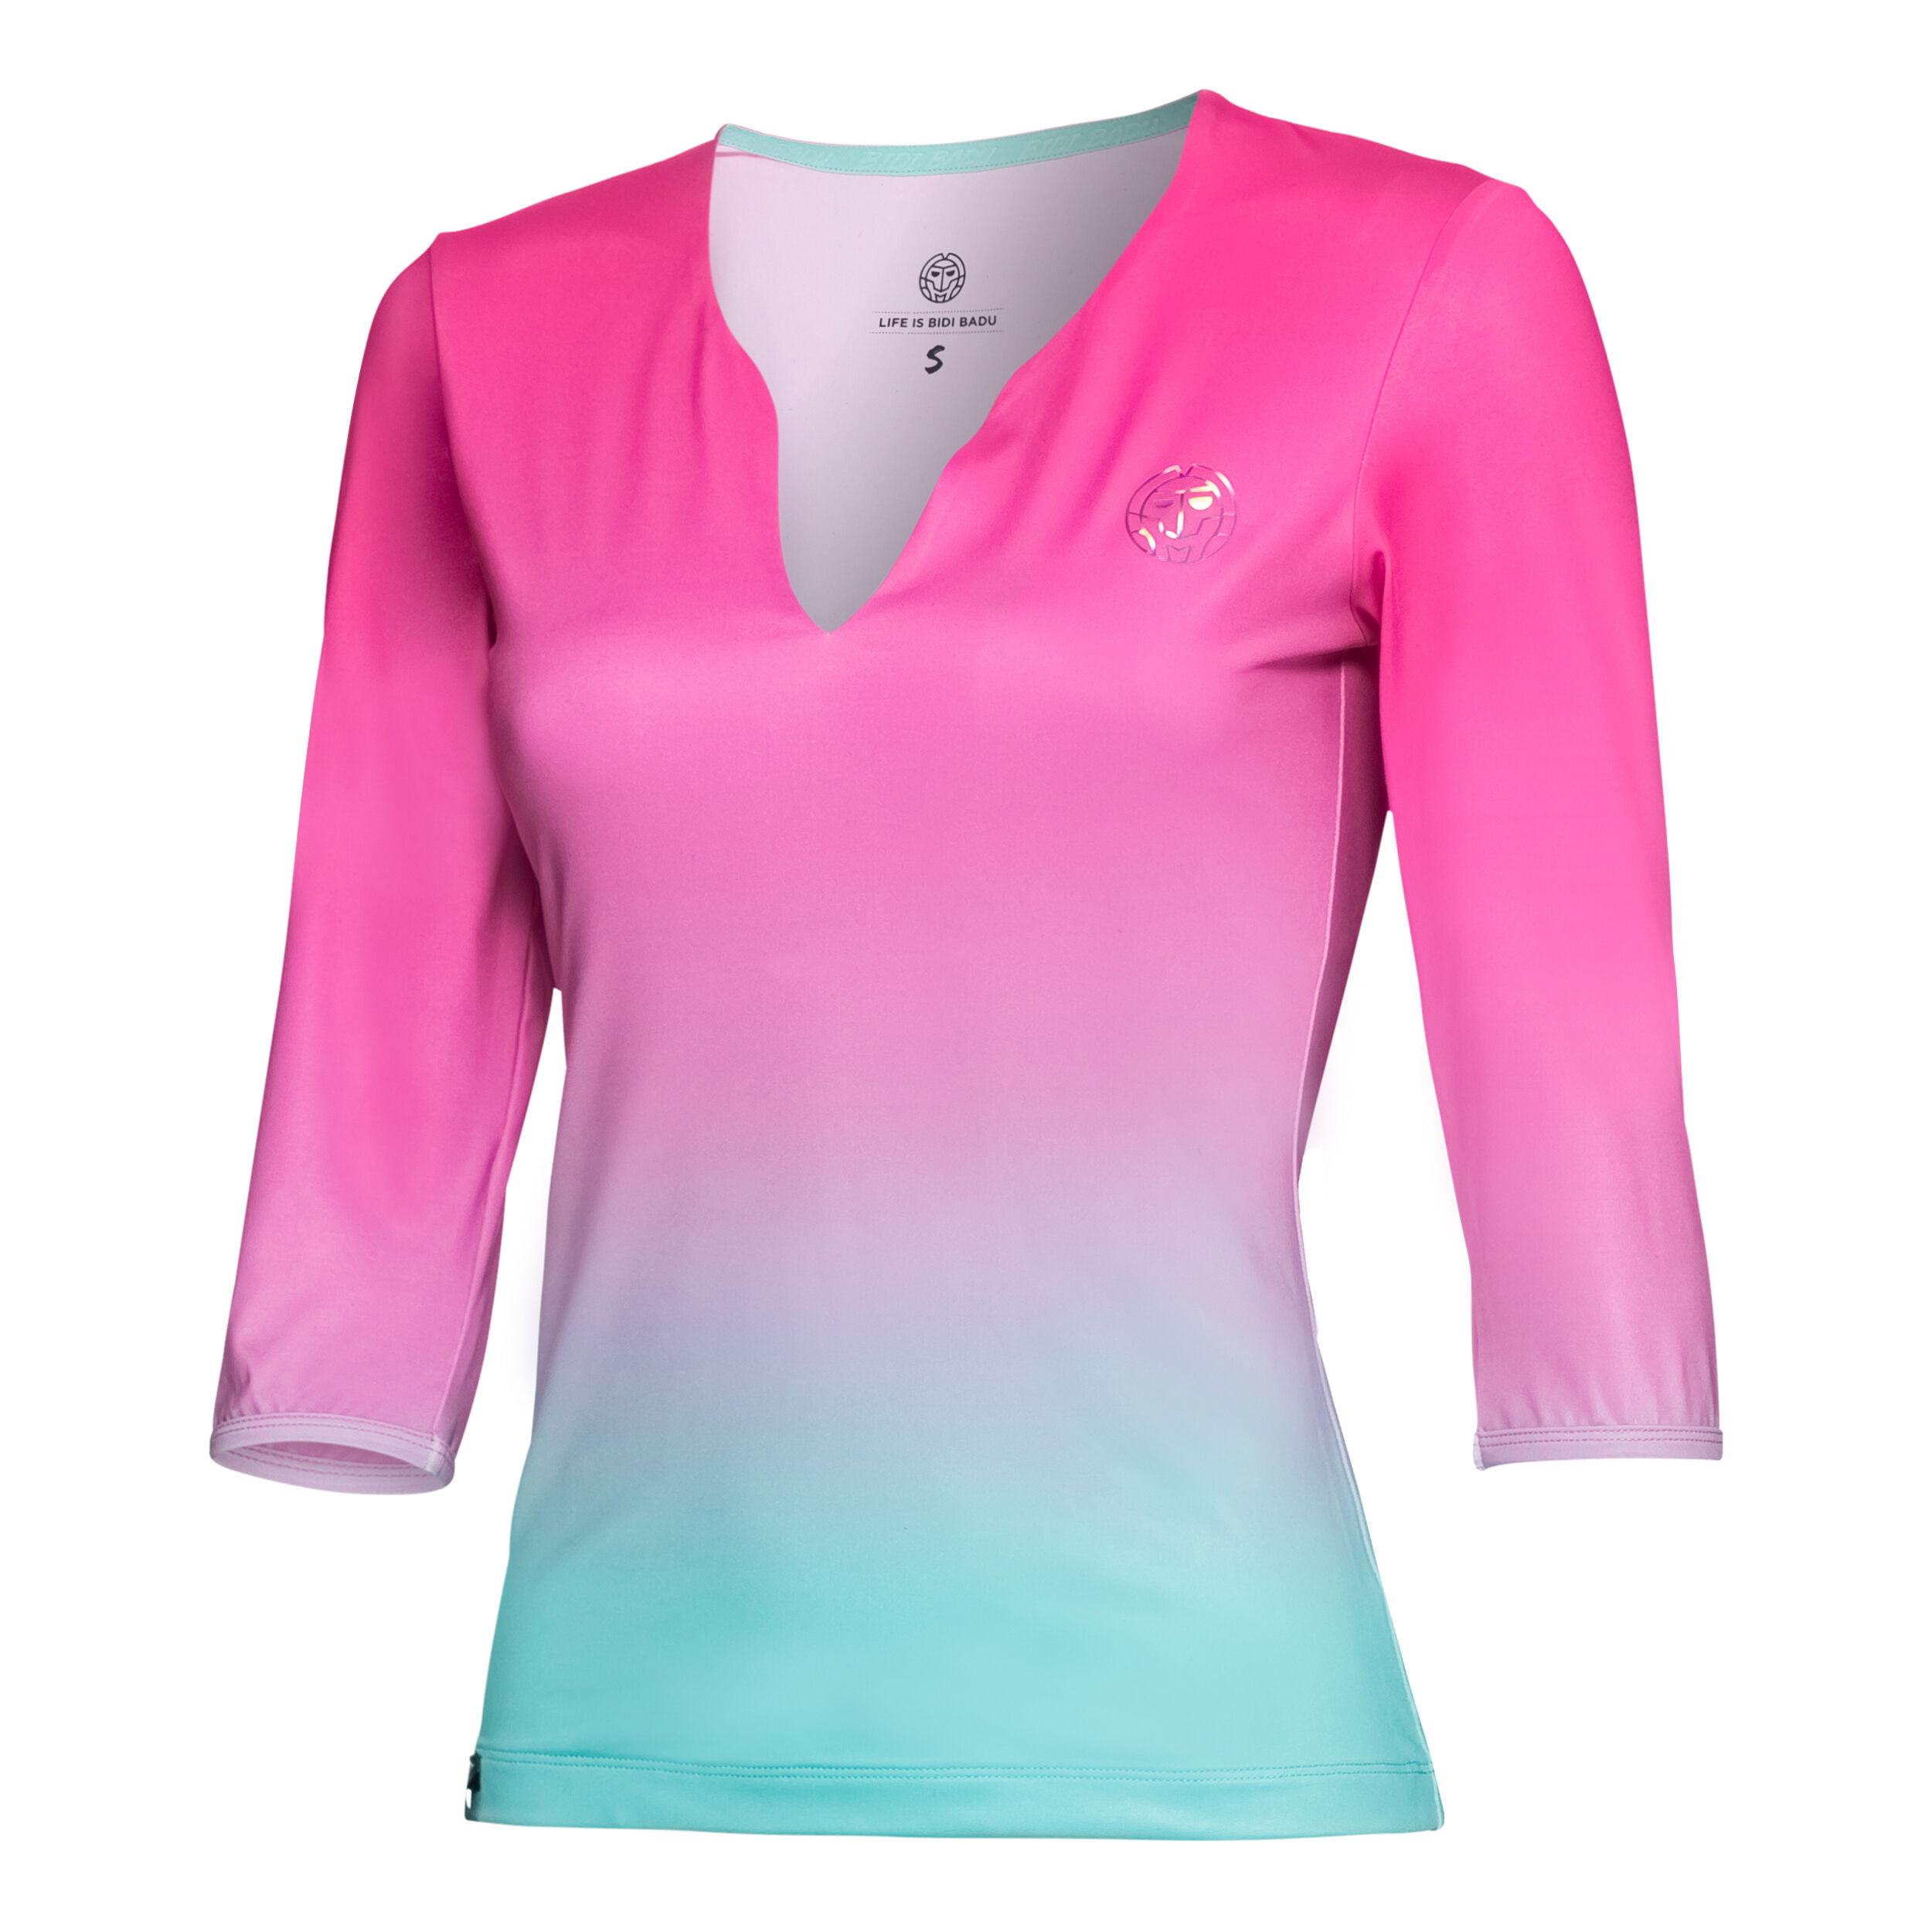 Puma Longsleeve Damen Rosa, Silber online kaufen   Jogging